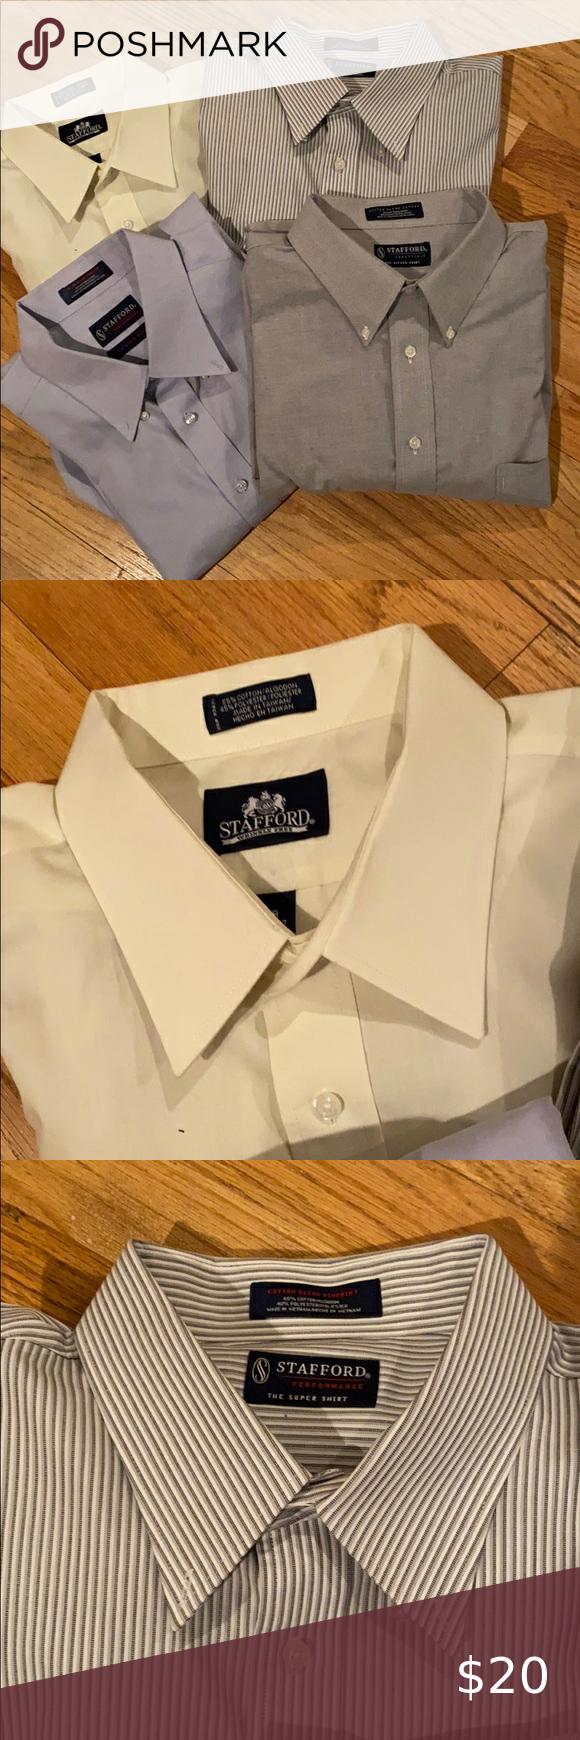 Stafford Men S Long Sleeve Shirts In 2020 Long Sleeve Shirts Short Sleeve Linen Shirt Long Sleeve Shirt Men [ 1740 x 580 Pixel ]